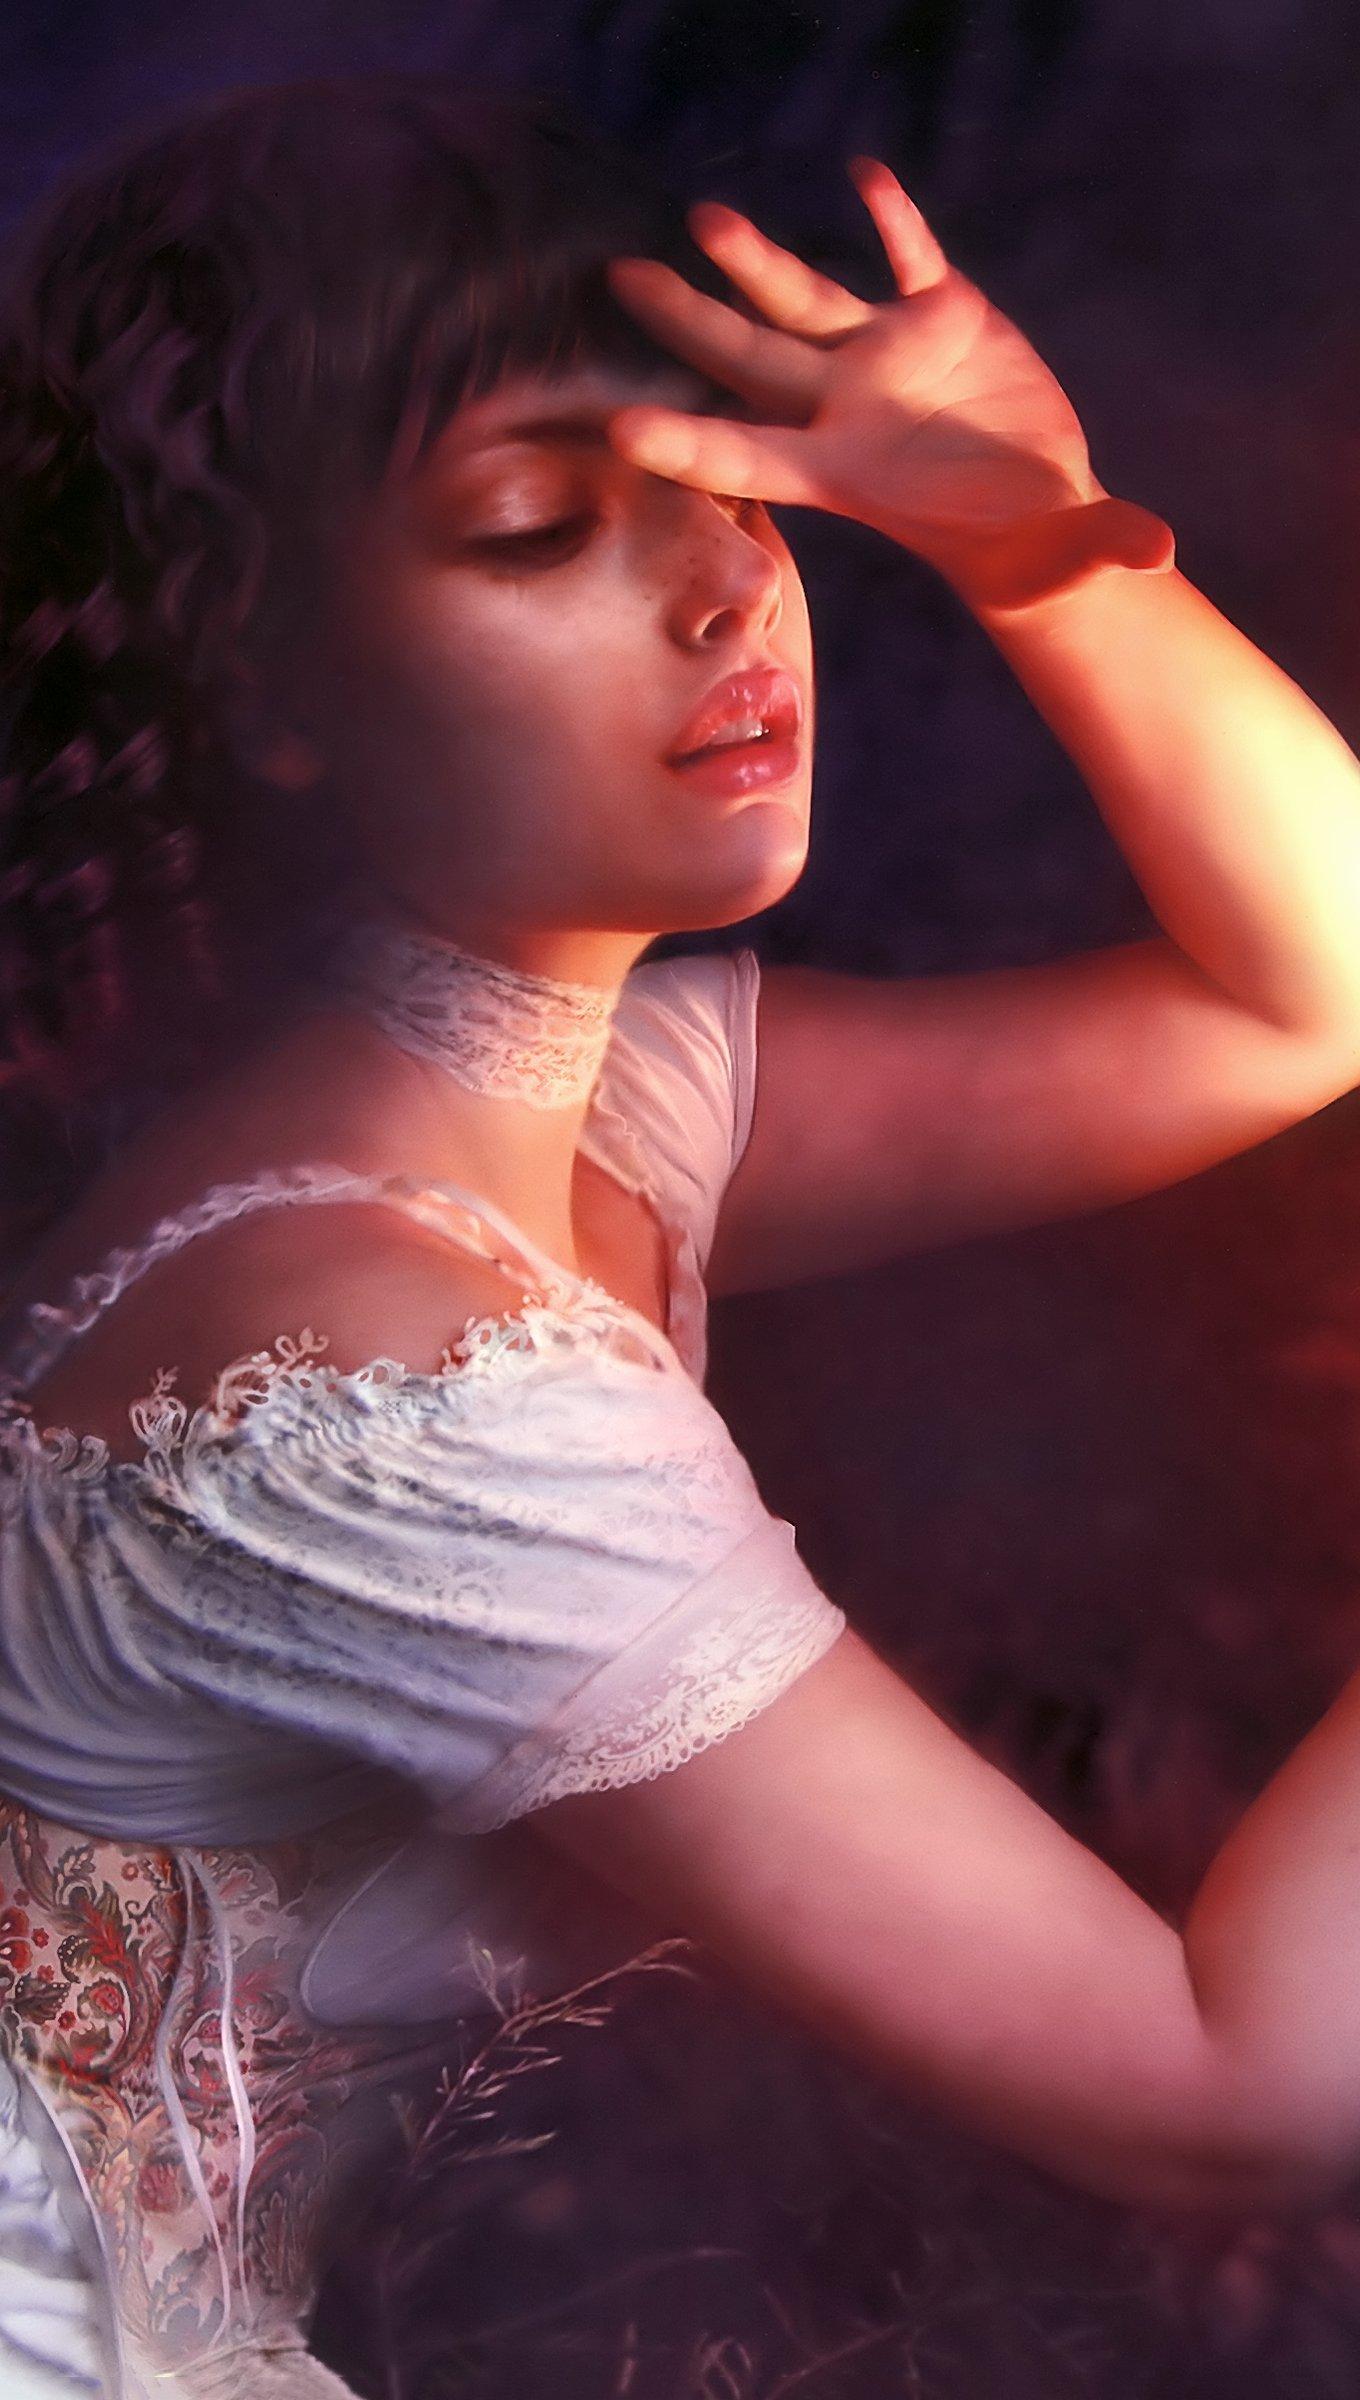 Fondos de pantalla Ilustración Mujer con fénix Vertical